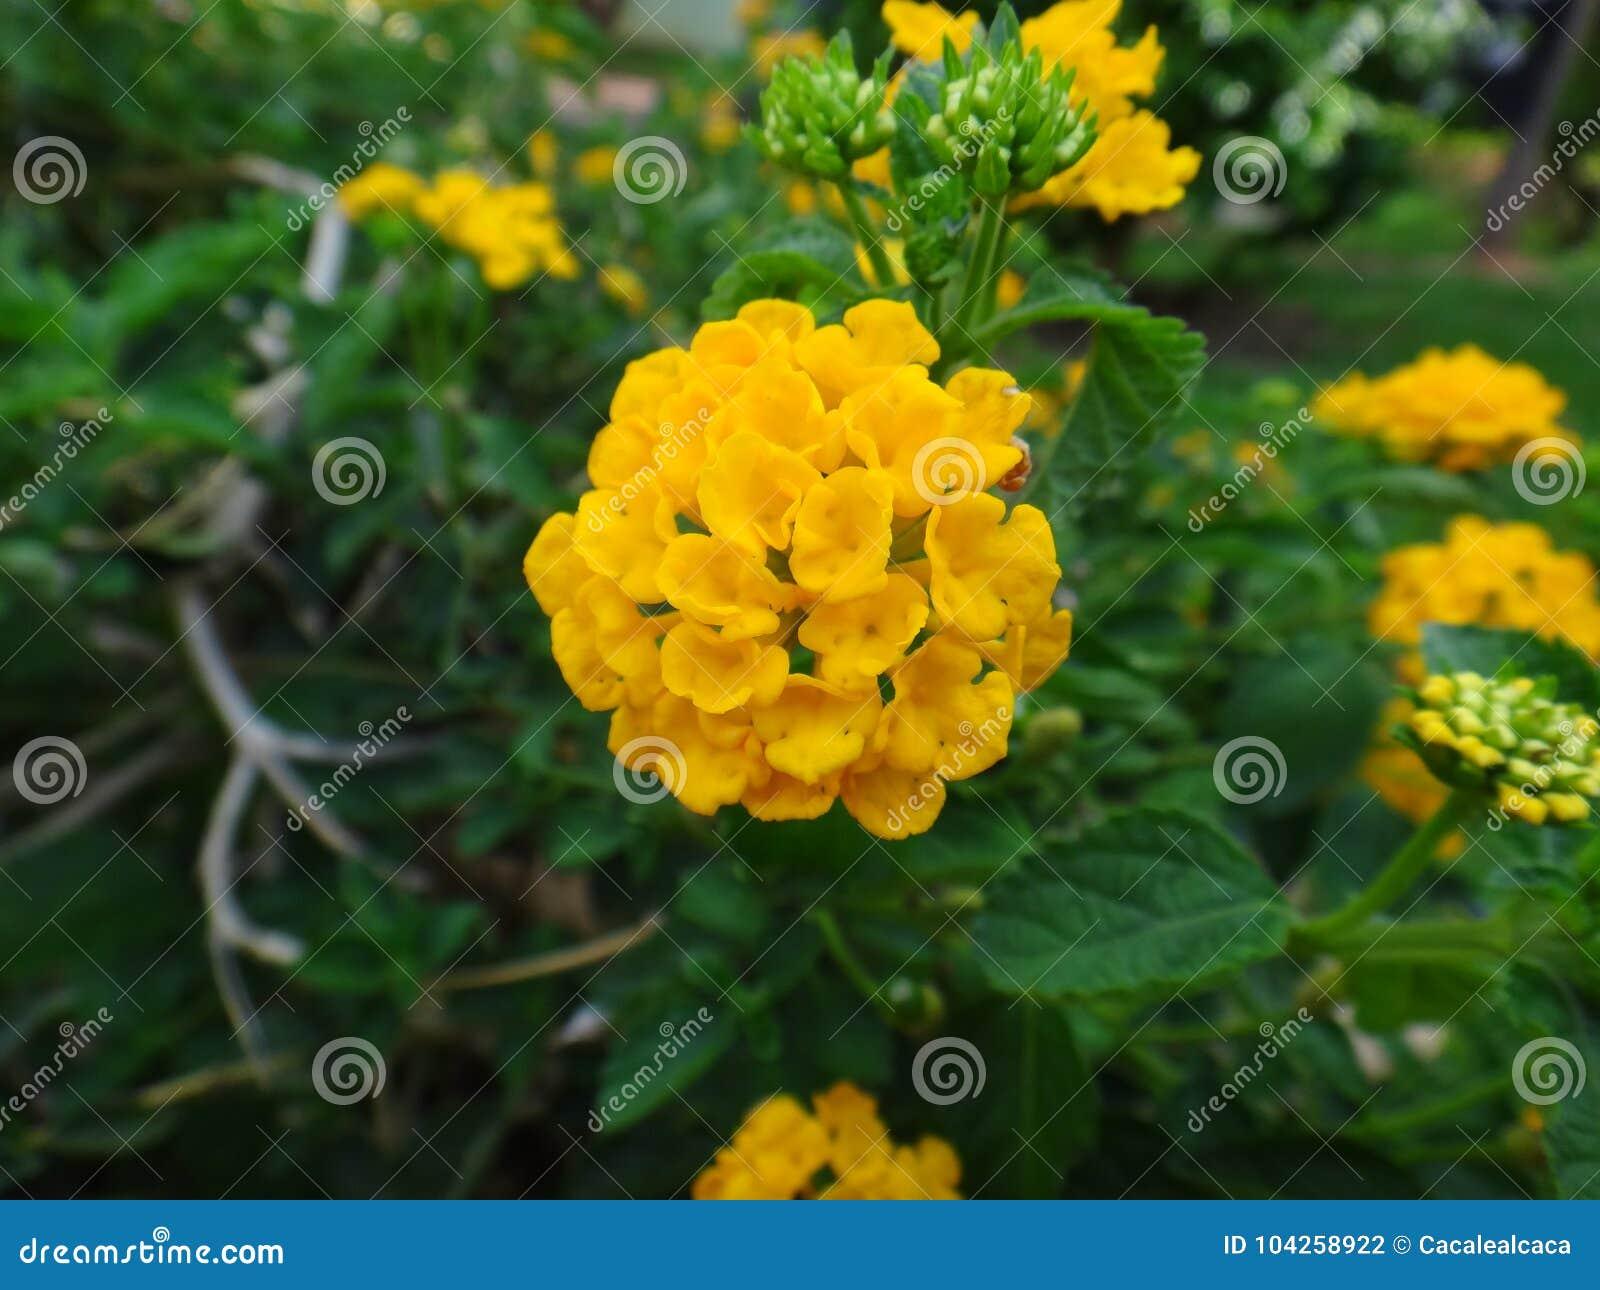 Lantana flowers yellow stock photo image of flattopped 104258922 lantana flowers yellow mightylinksfo